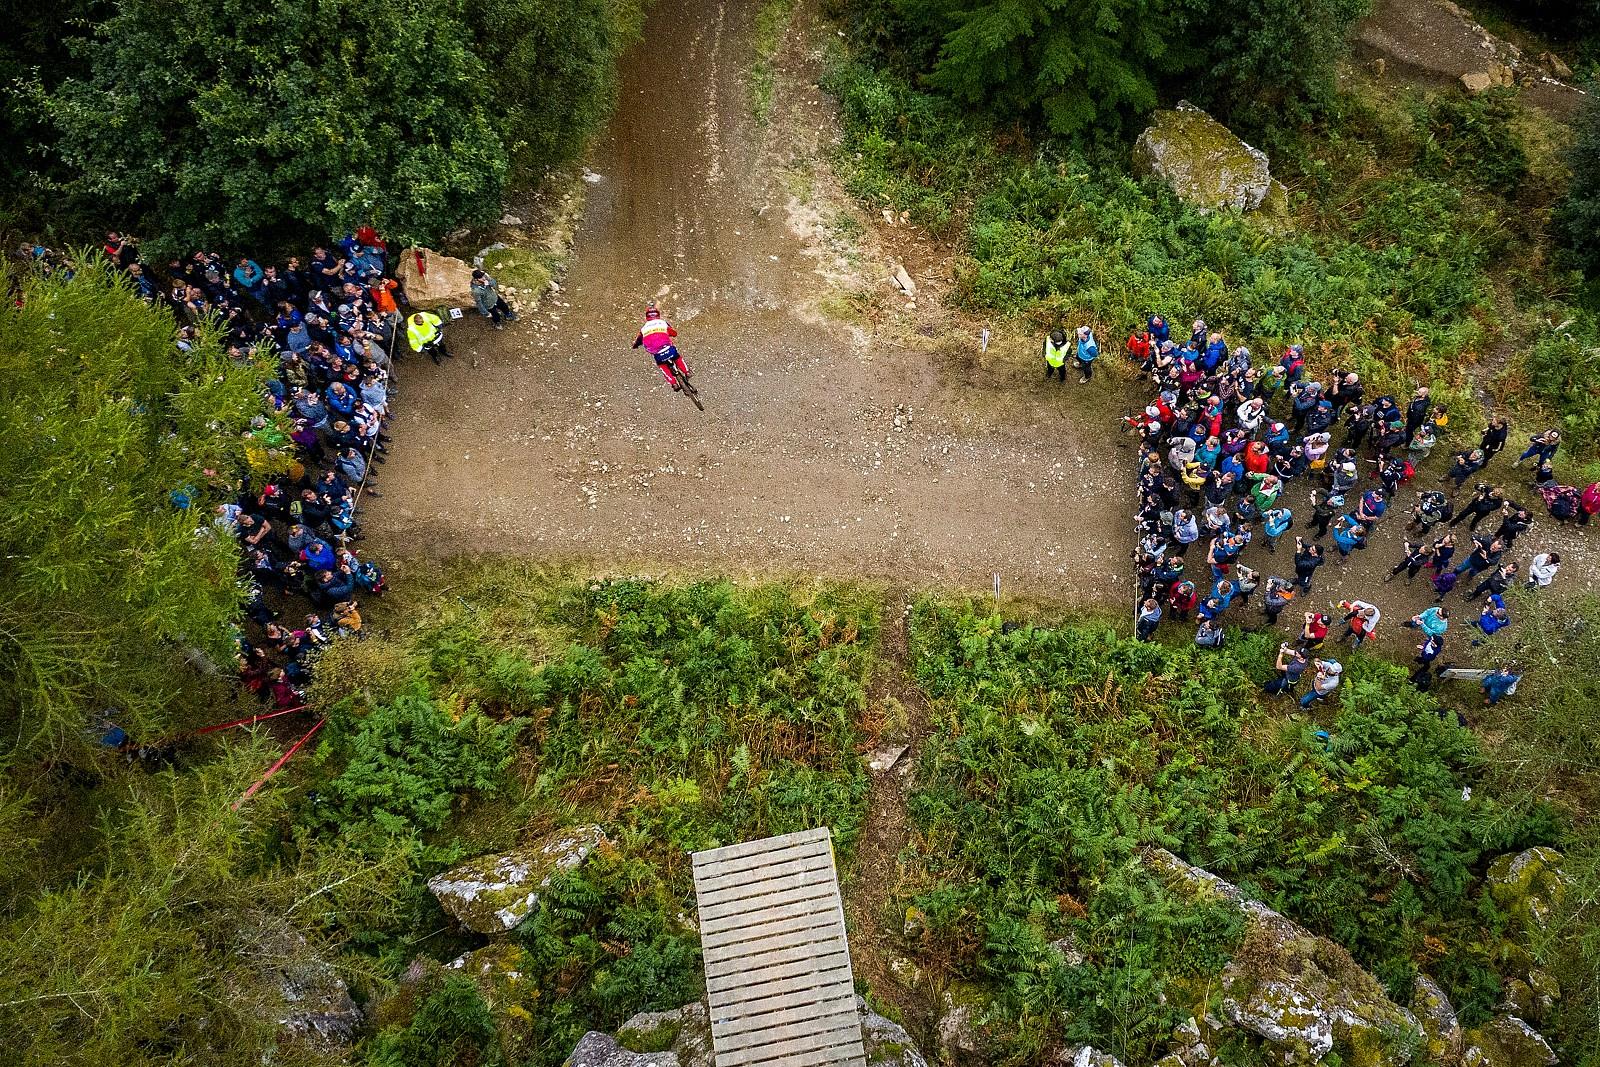 Harry Molloy, Red Bull Hardline Road Gap - Red Bull Hardline in Photos - Mountain Biking Pictures - Vital MTB